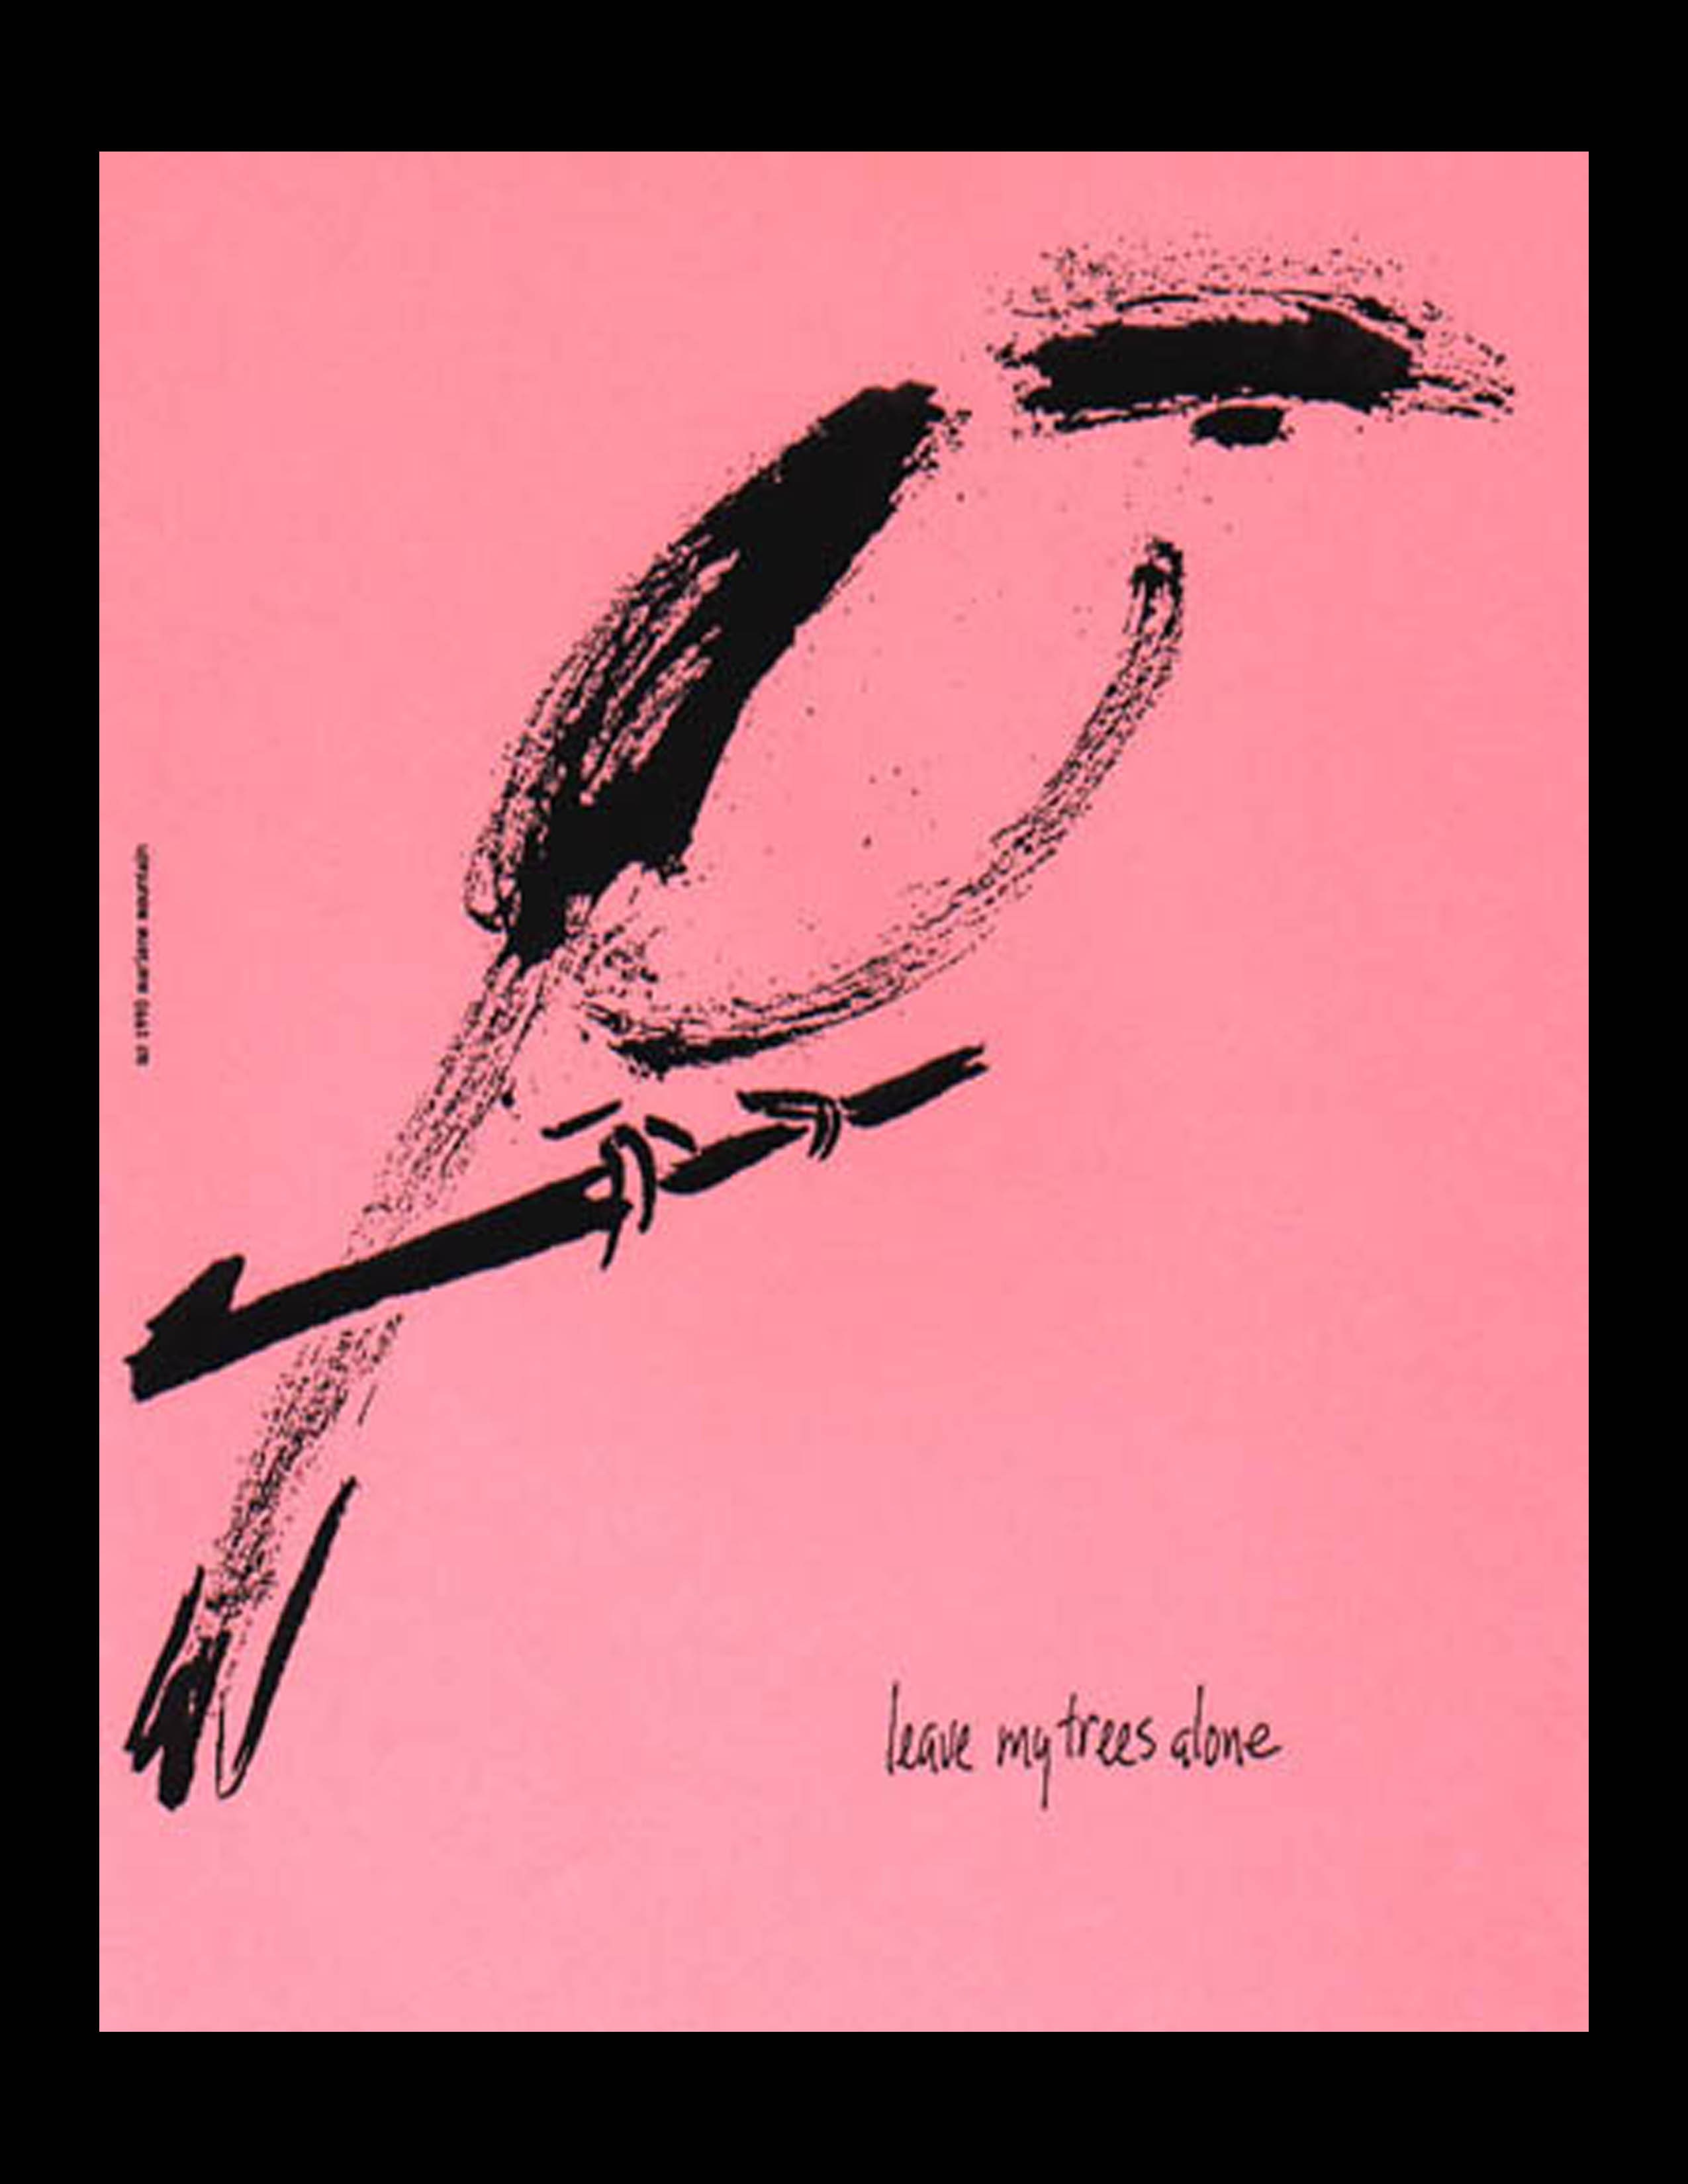 leave my trees alone (image 1968-9, haiku 1992)